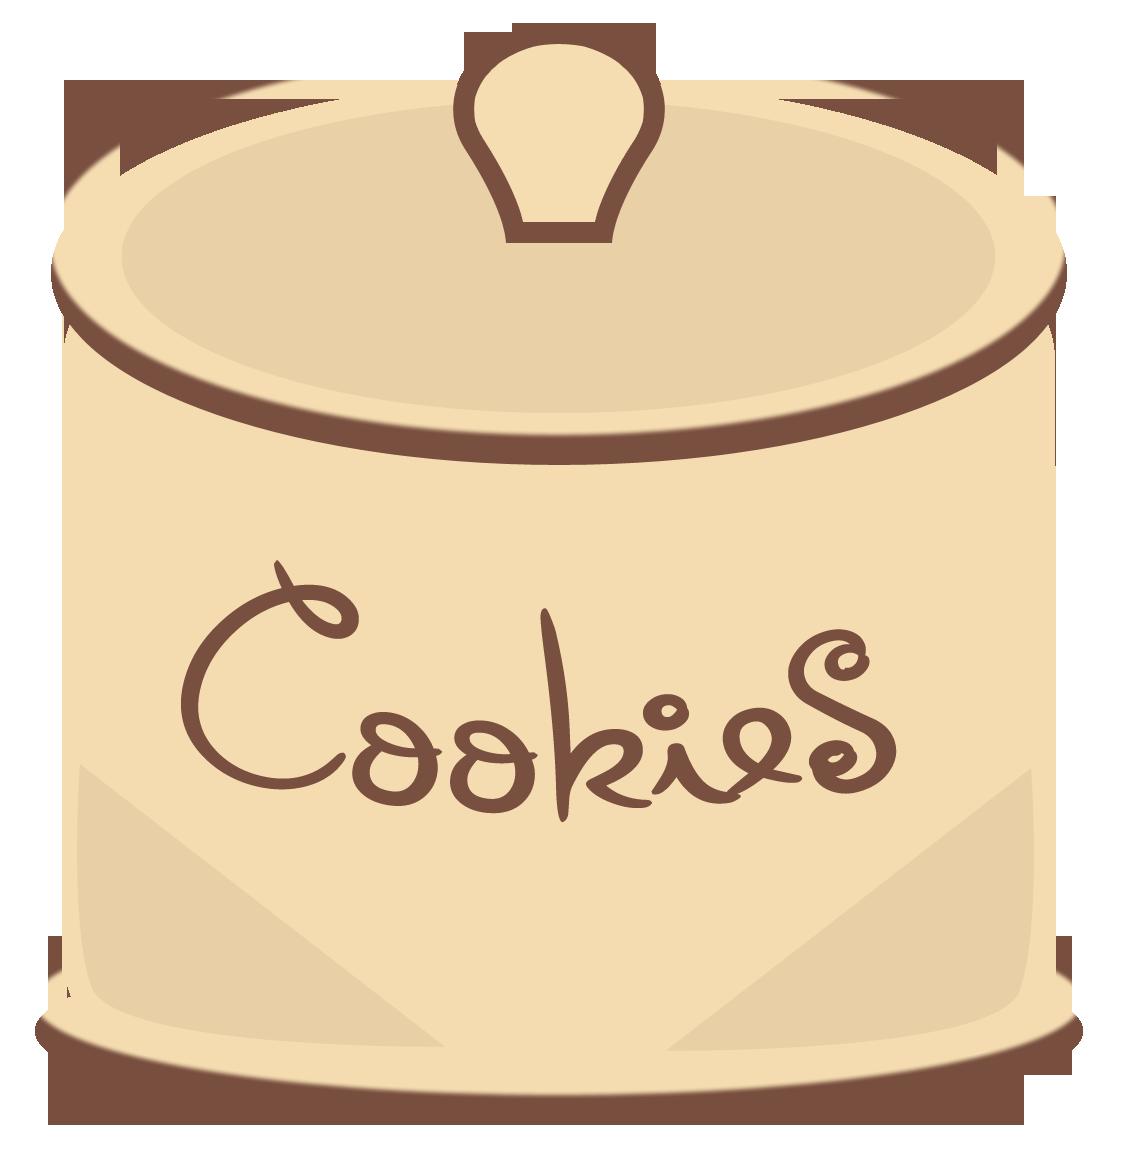 Plate clipart chocolate chip cookie. Jar karen